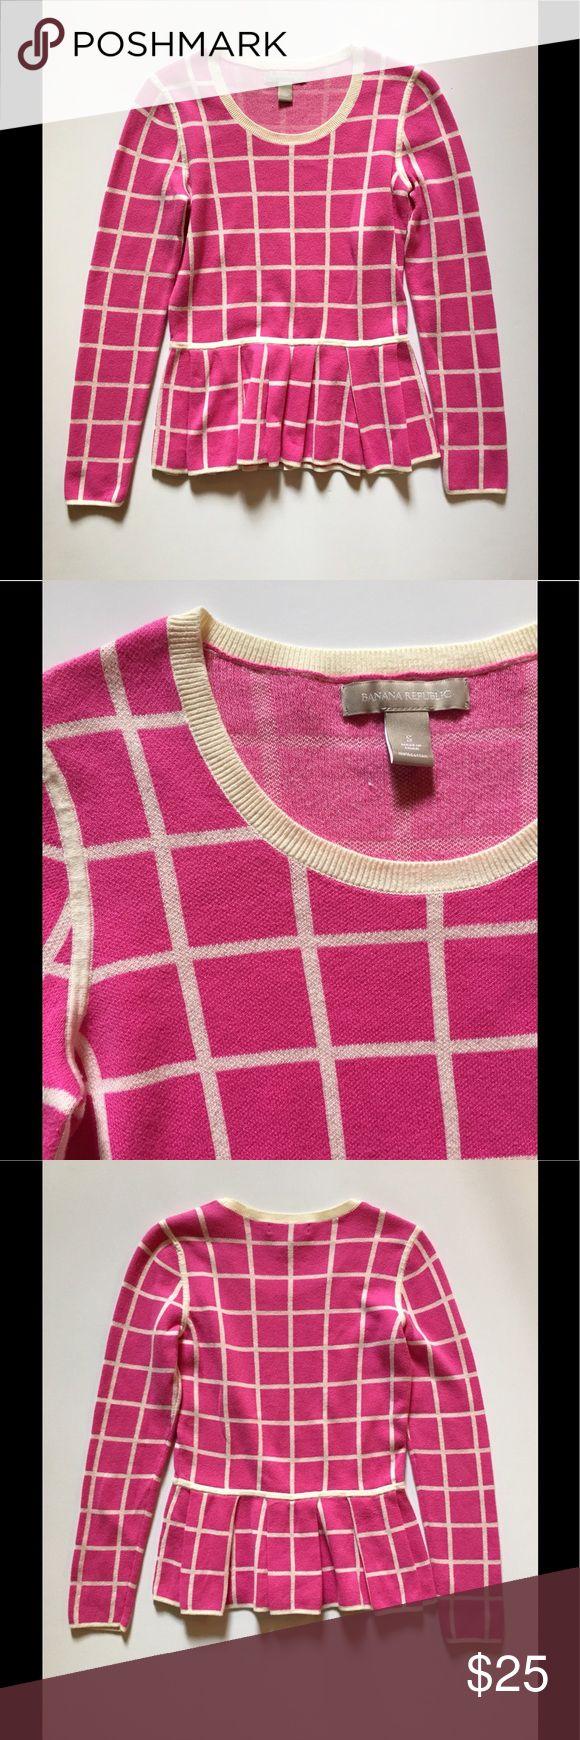 Banana Republic peplum sweater Pink and cream Banana Republic pleated peplum sweater. 100% cotton. Machine wash or dry clean. Banana Republic Sweaters